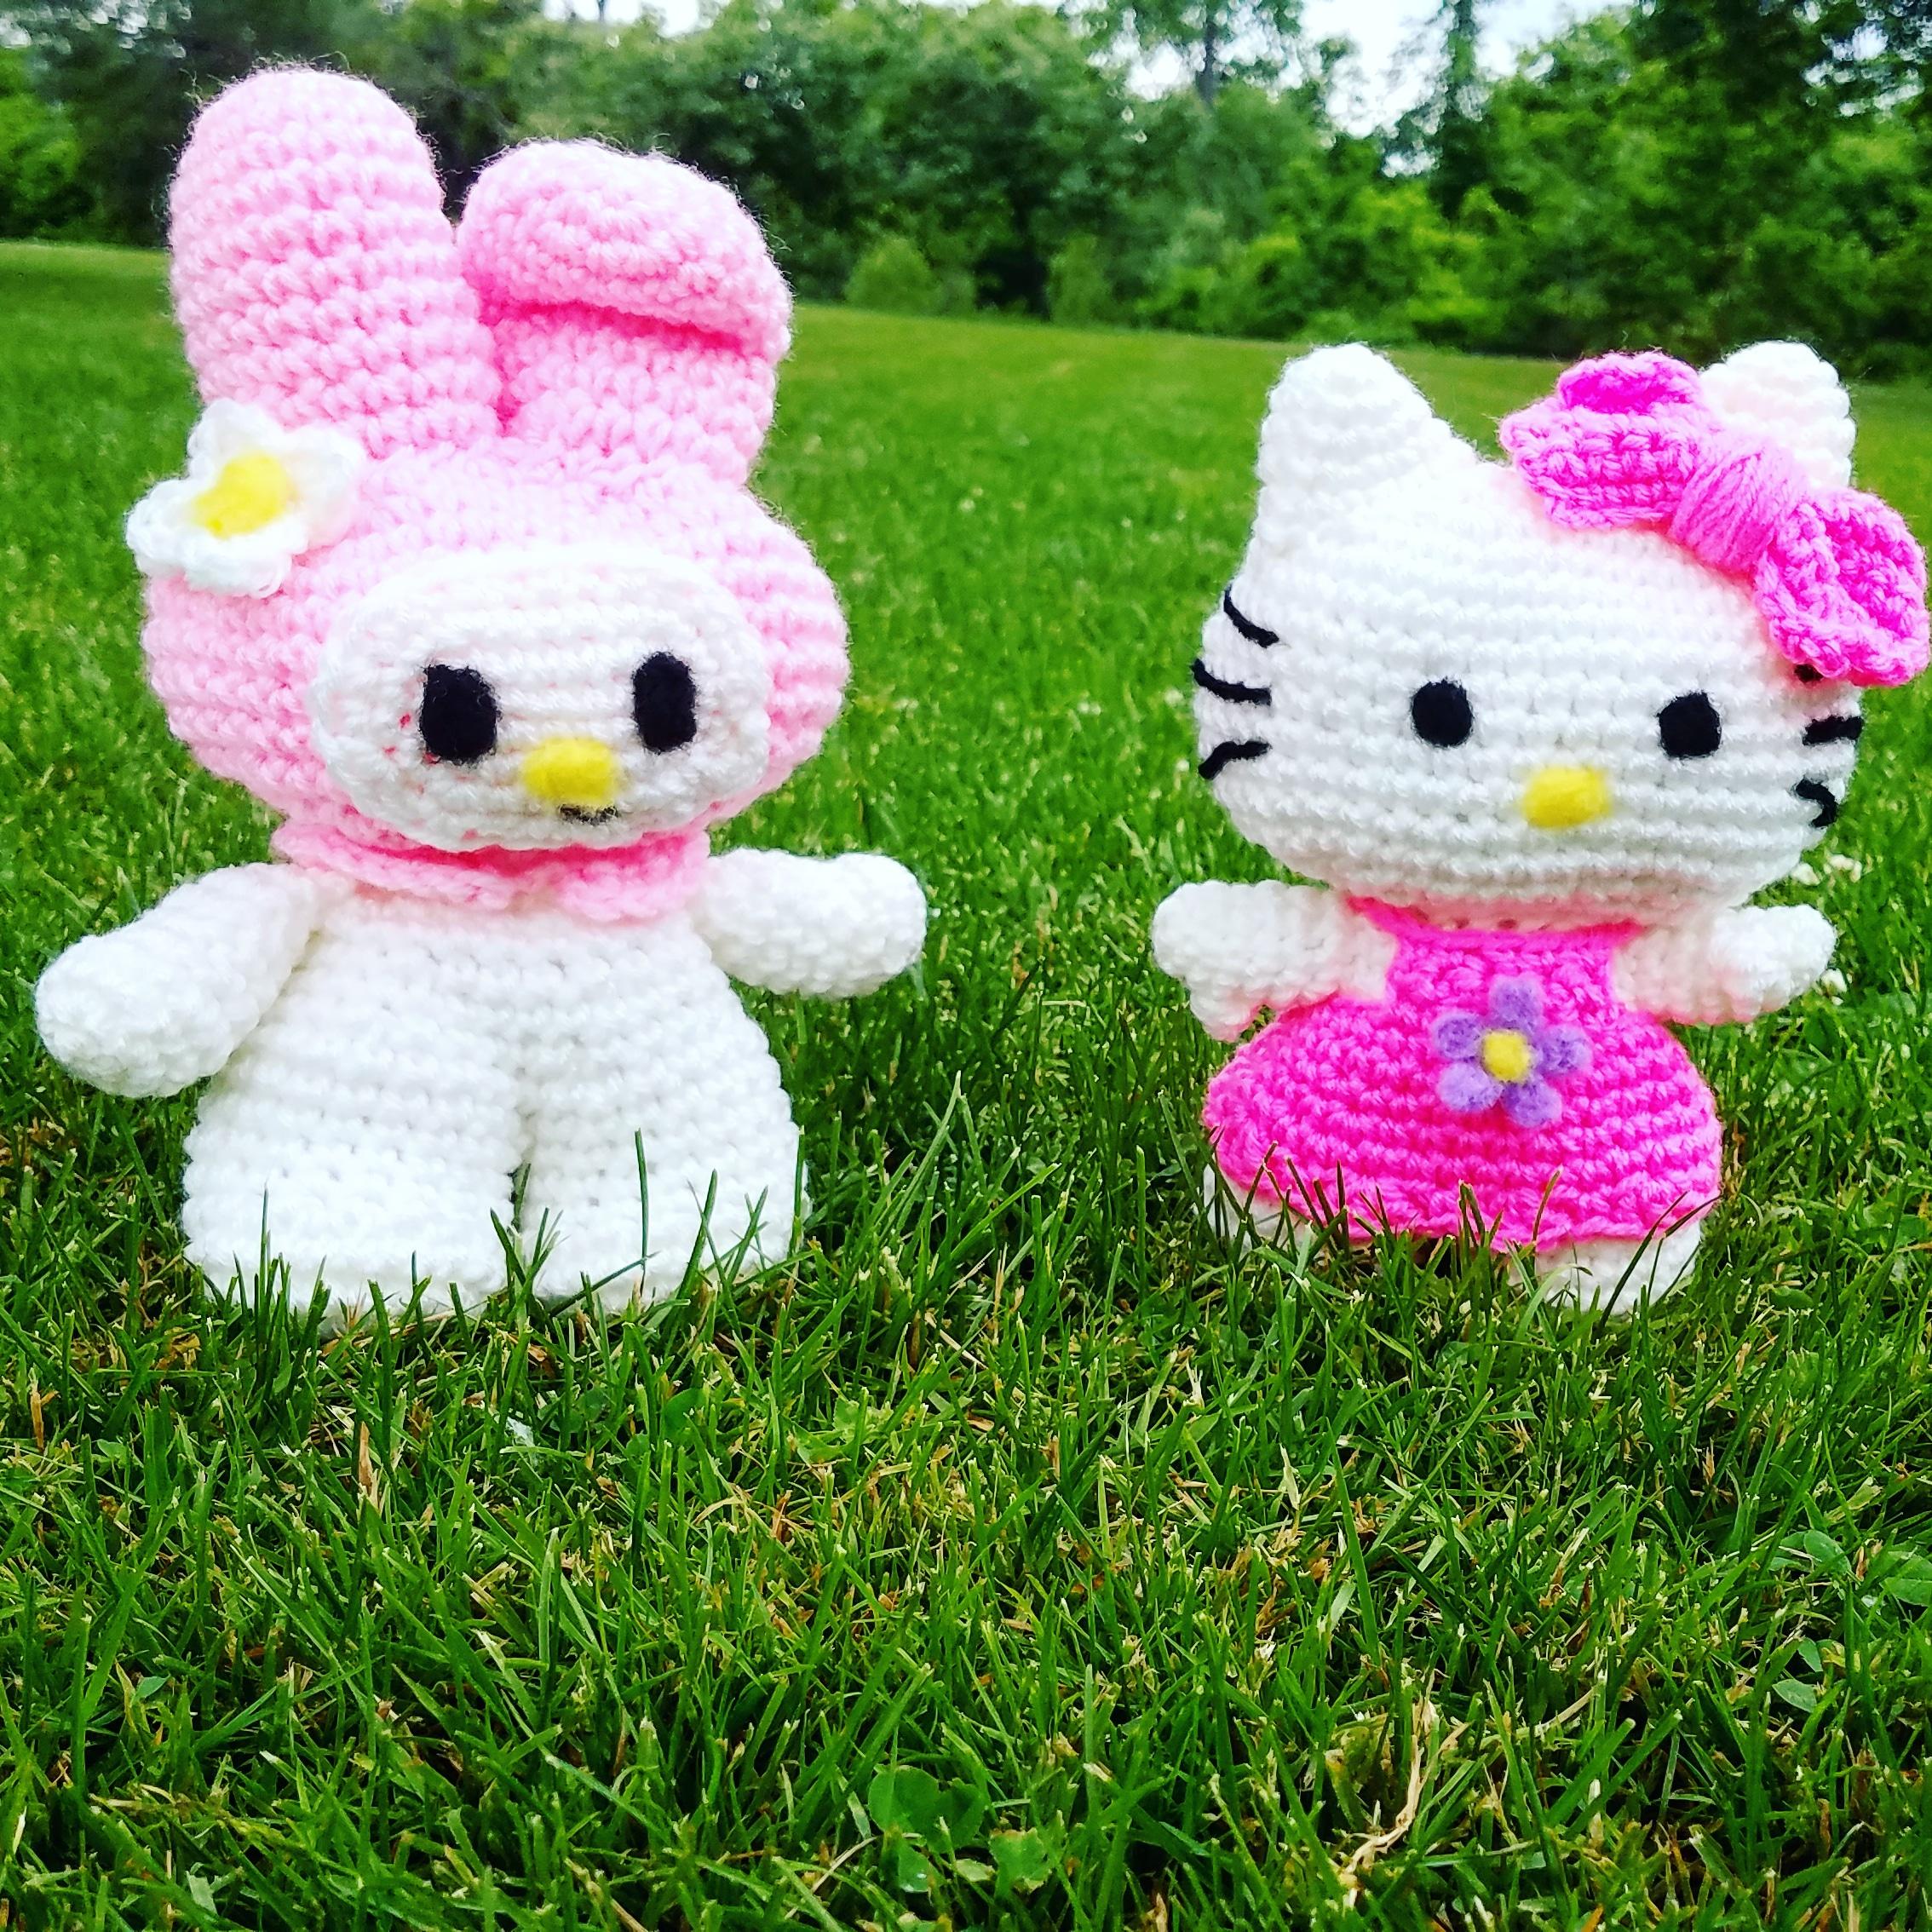 Keroppi – Amigurumi Pattern | Amigurumi pattern, Crochet patterns ... | 2268x2268